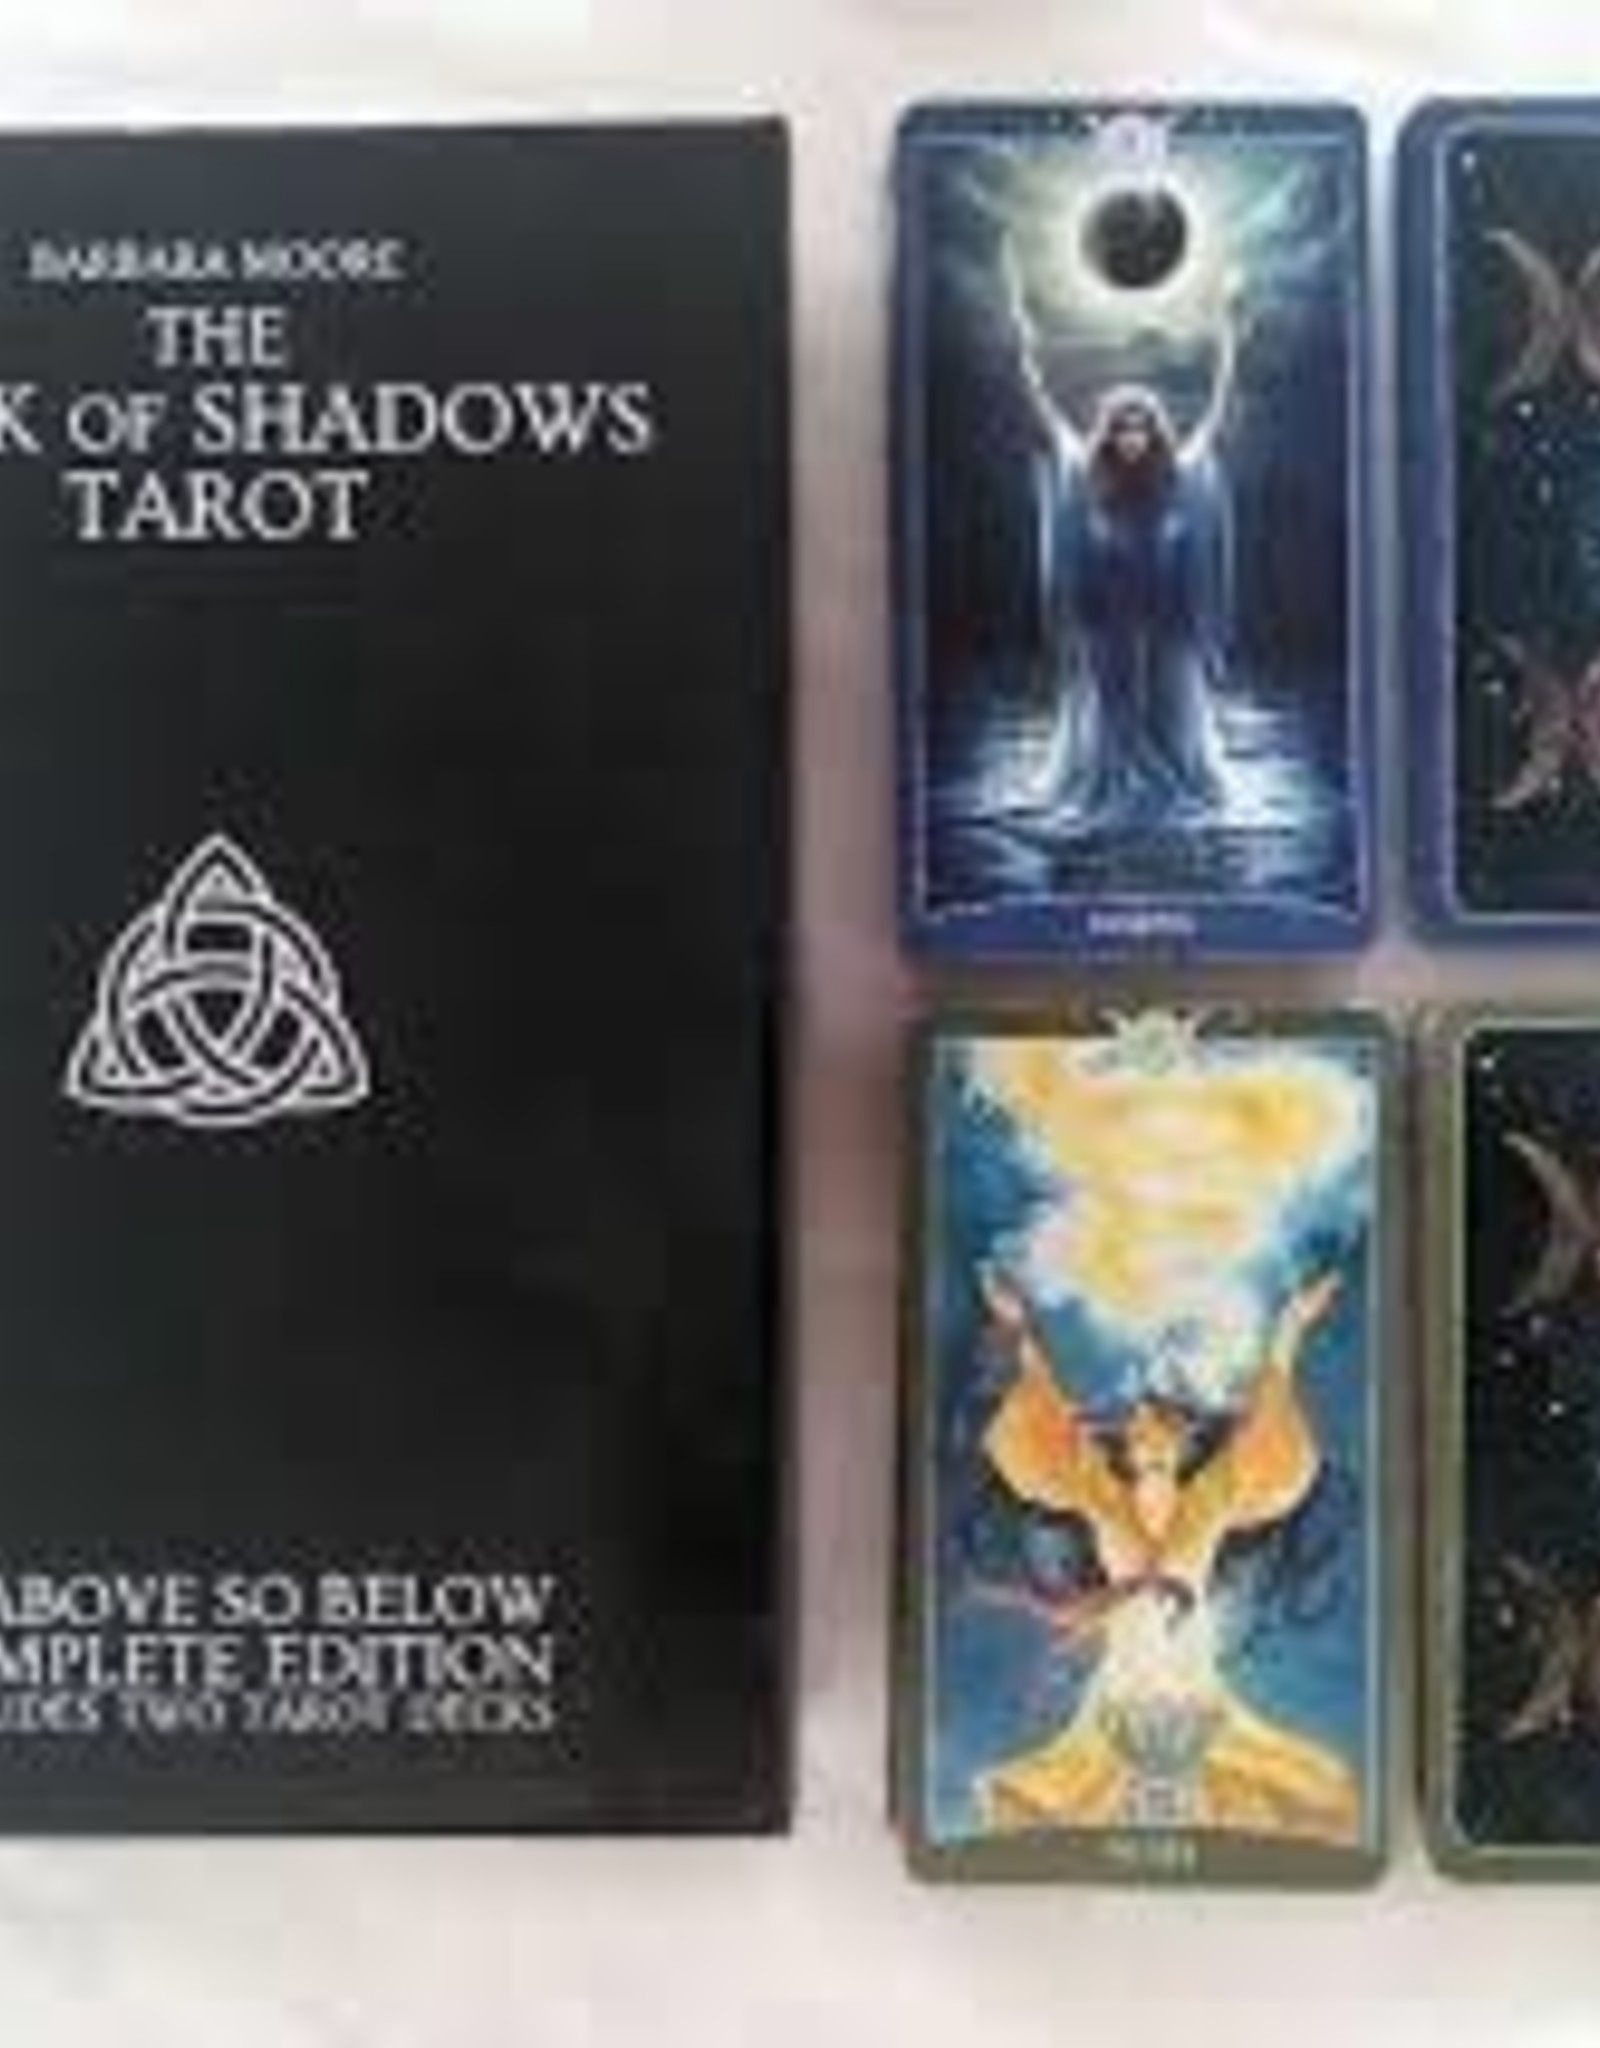 Deck Kit - The Book of Shadows Tarot LLW